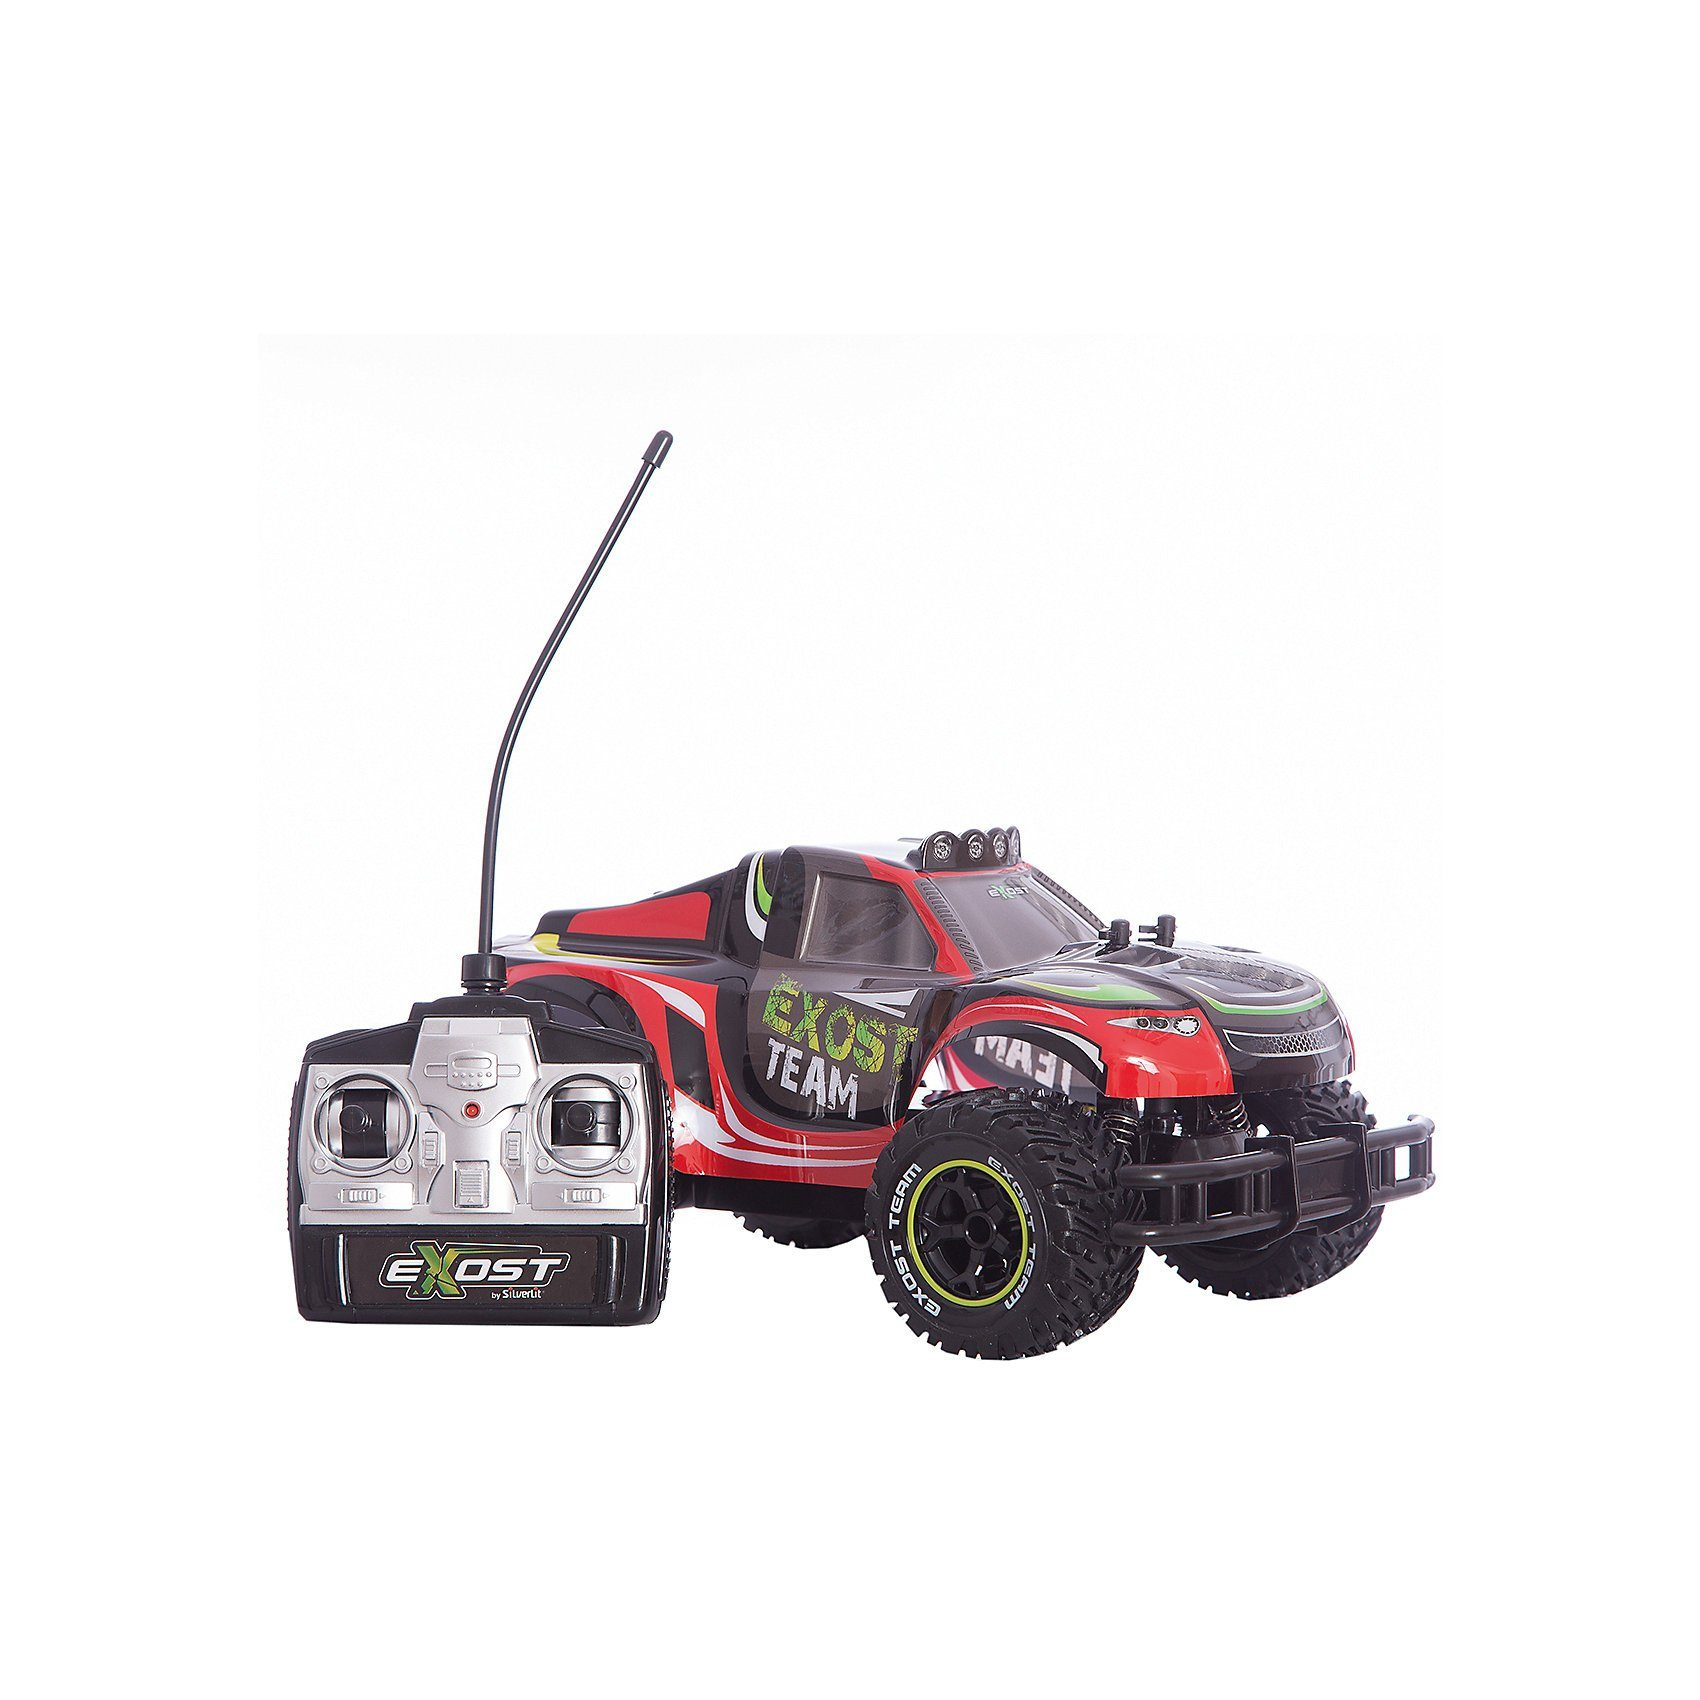 Silverlit RC Fahrzeug Exost Super Wheel Truck 1:12